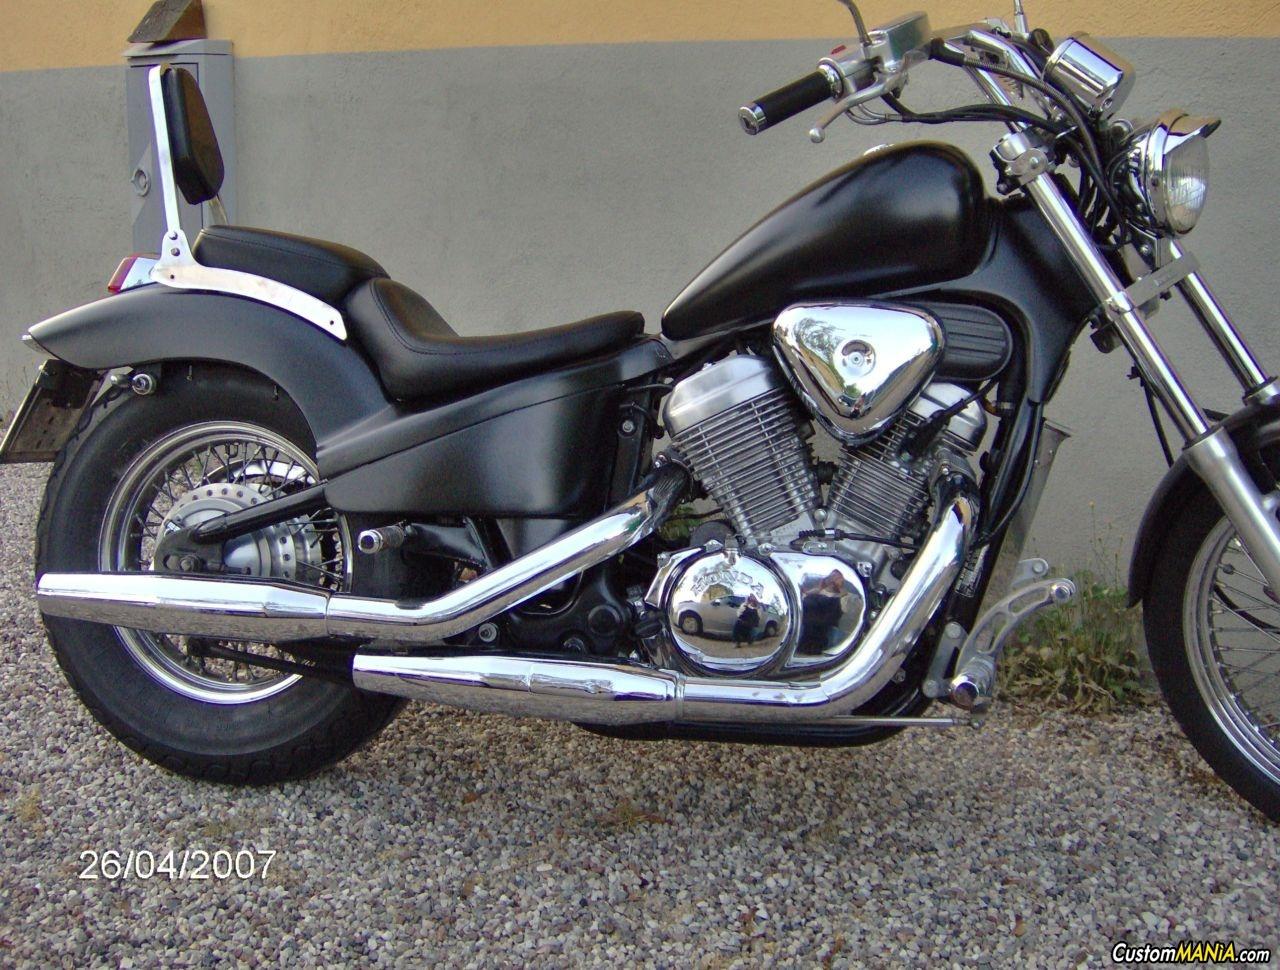 Schema Elettrico Honda Shadow 600 : Schema elettrico honda shadow